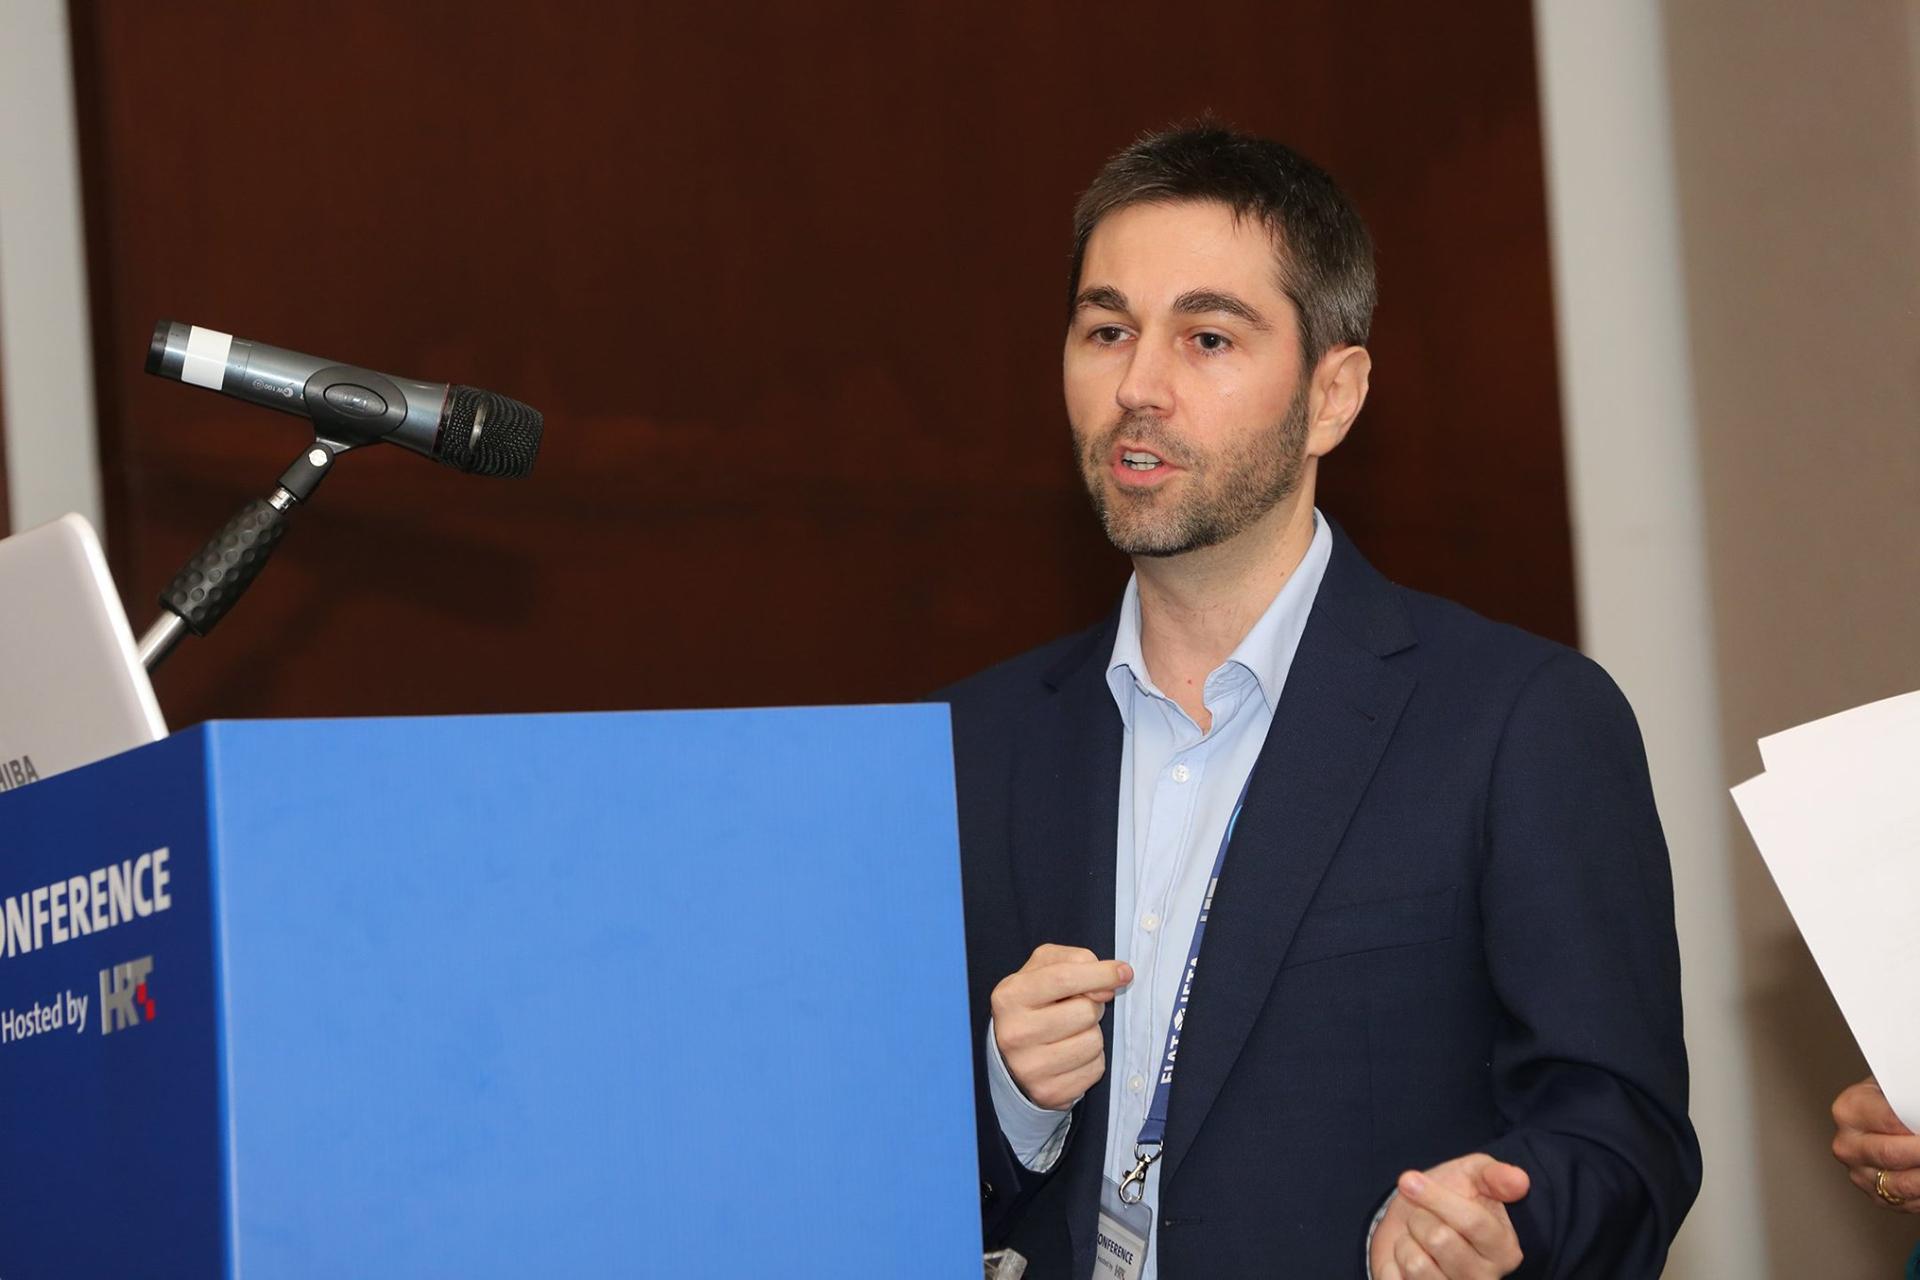 VSN presentation at the FIAT/IFTA World Conference 2019 on Semantics